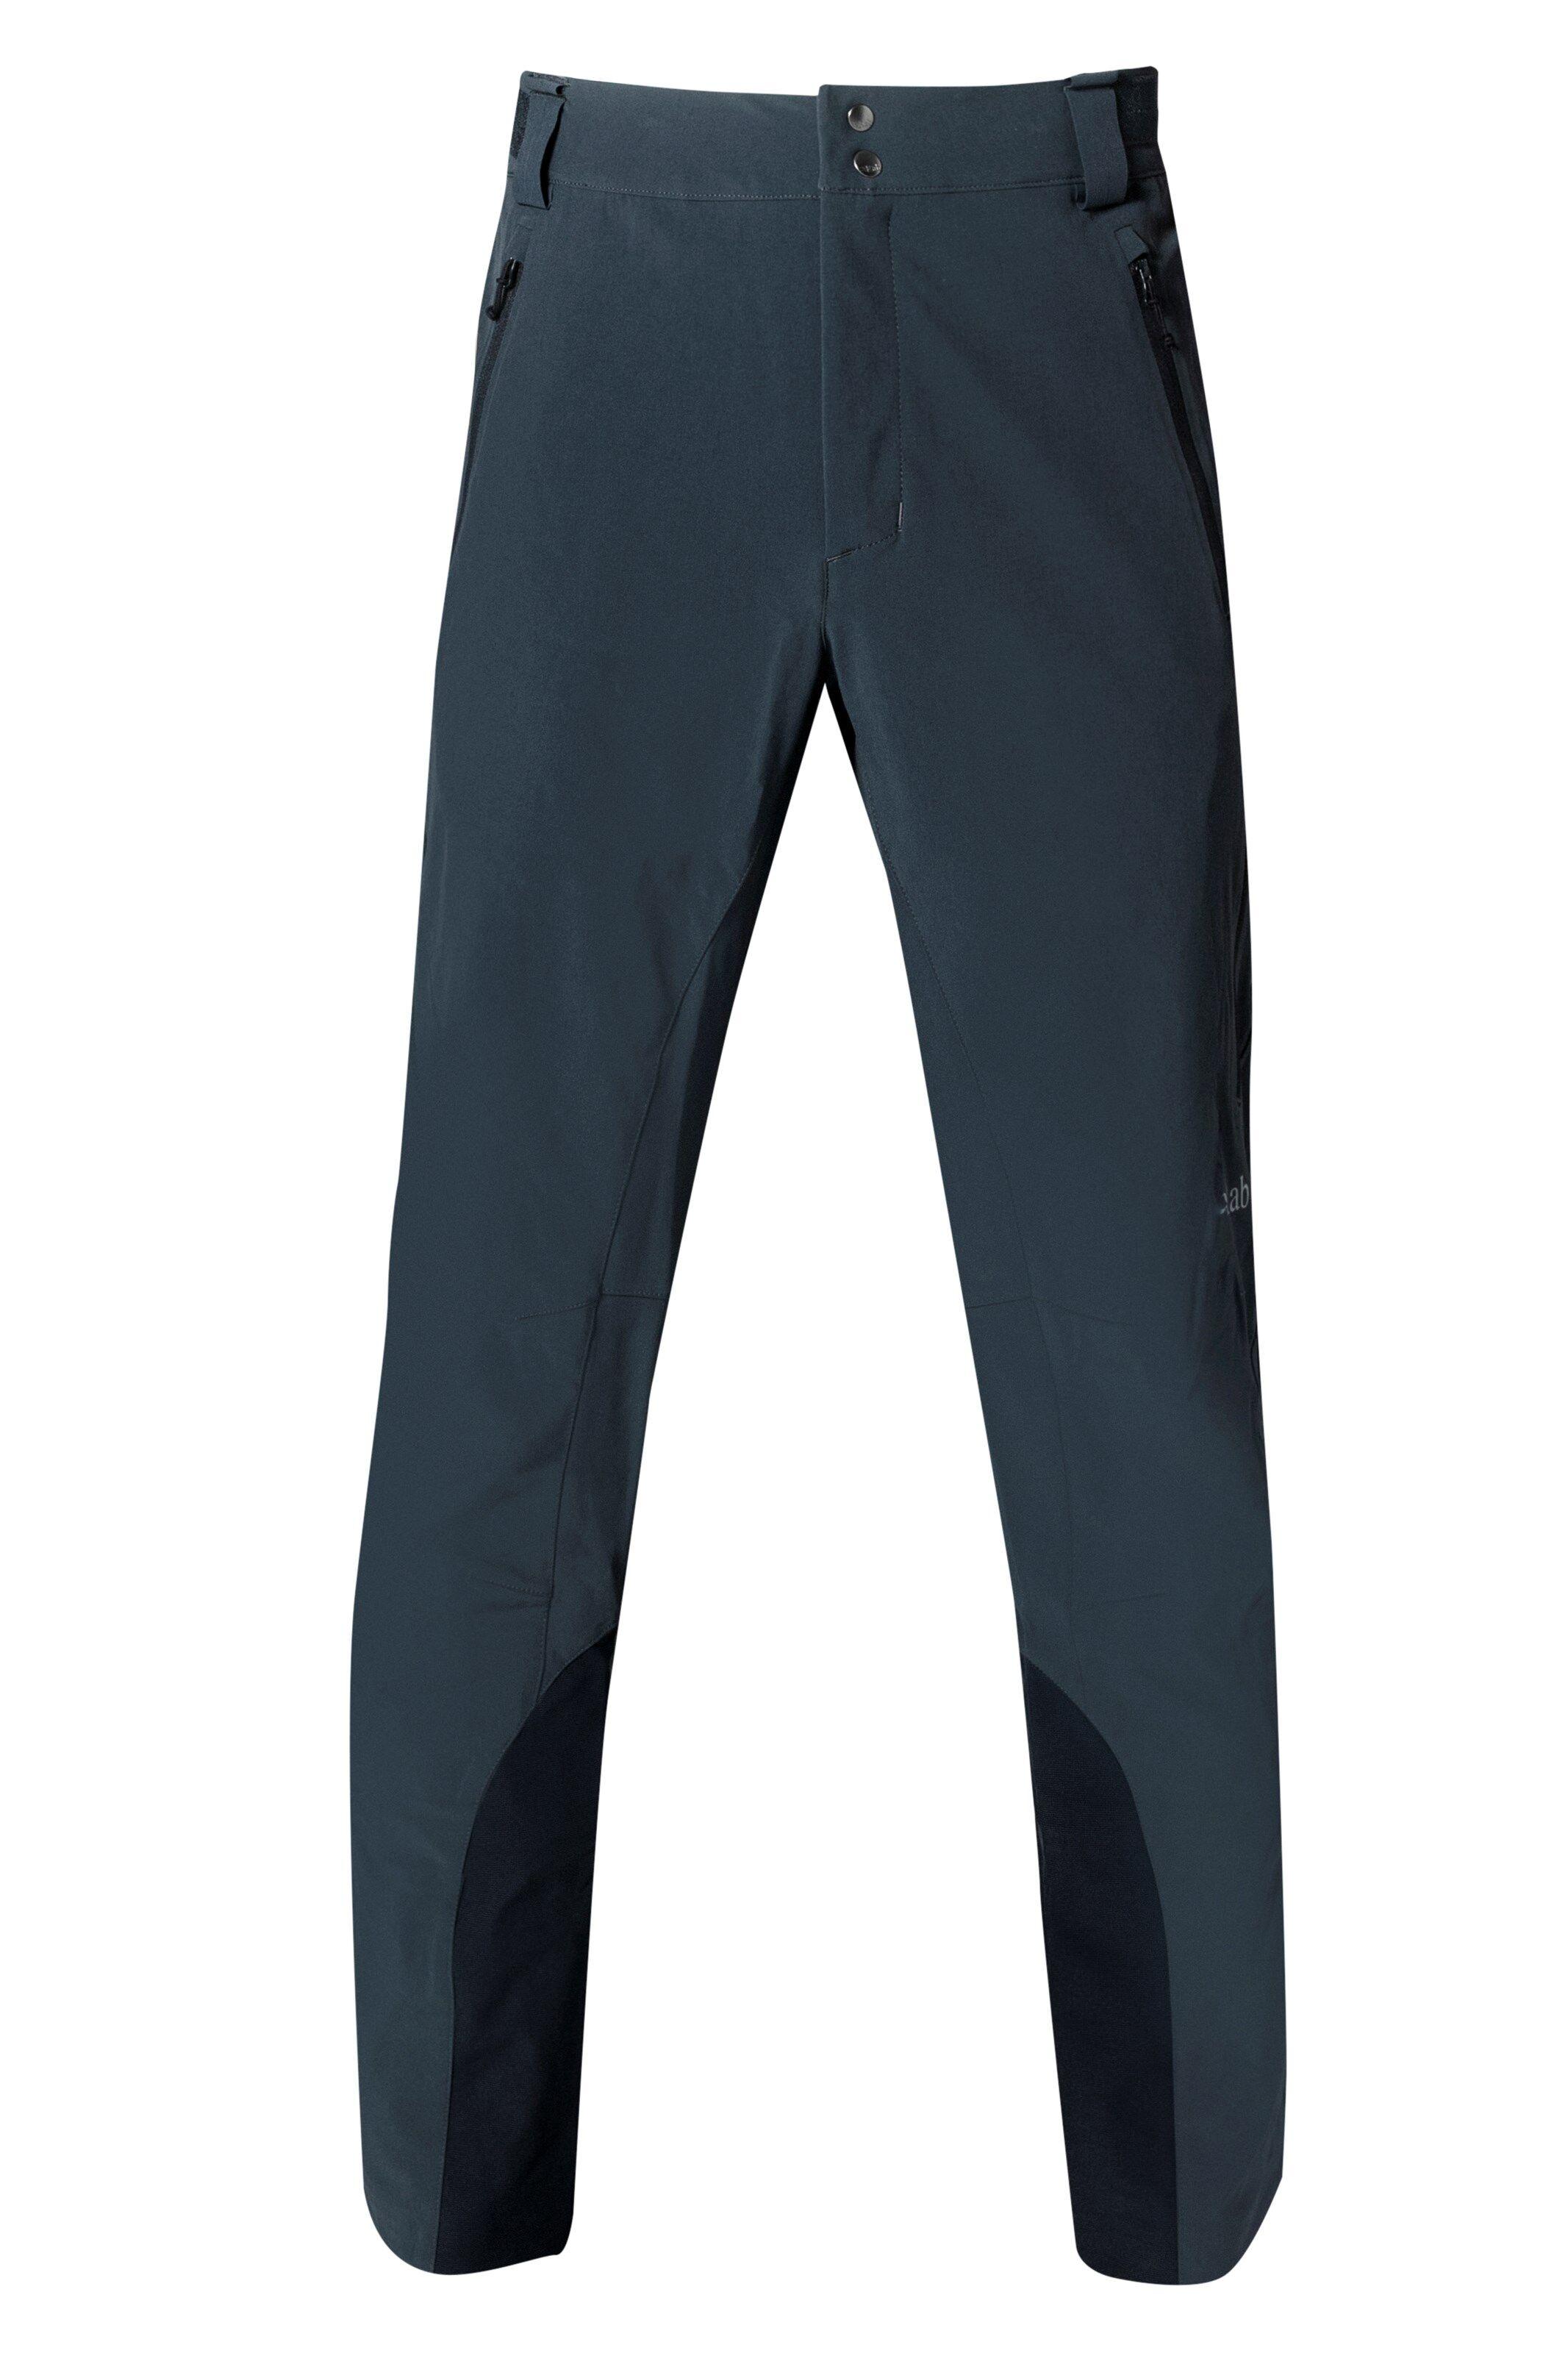 Rab Ascendor Pants, softshellbukse herre Ebony/Zinc QFU-16-EB XL 2018